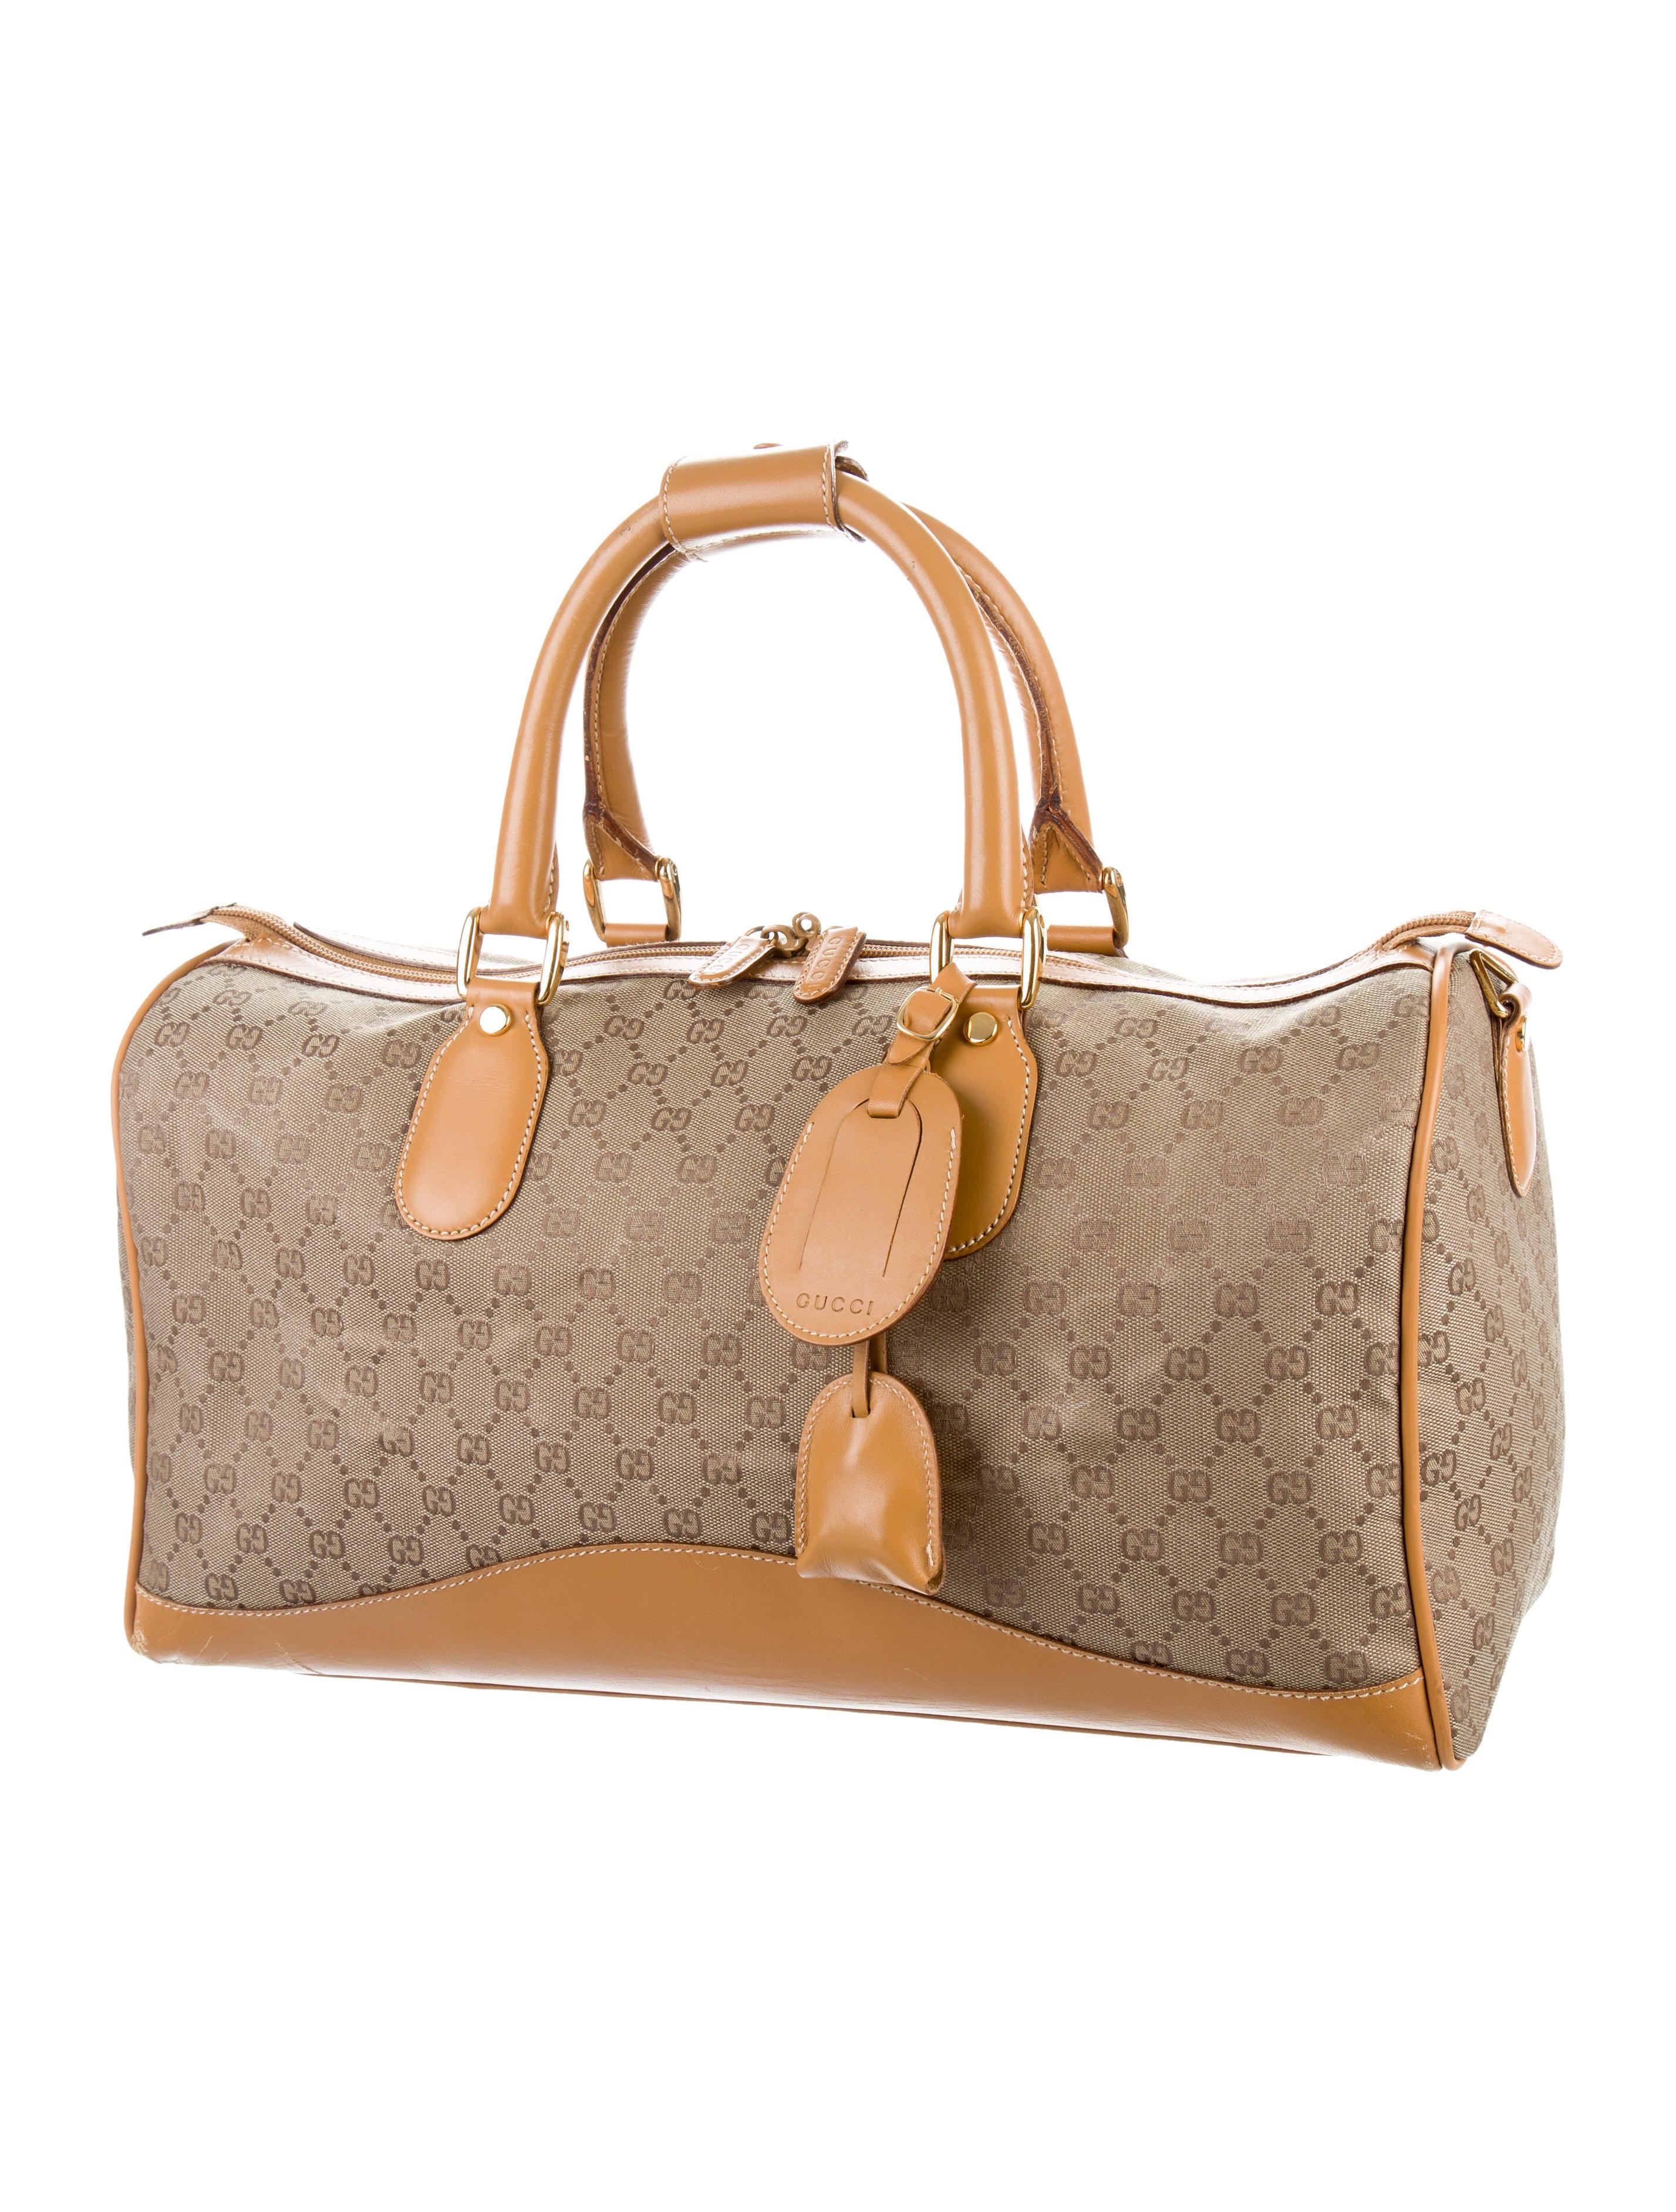 239263360e7f87 Gucci Vintage GG Weekender - Handbags - GUC163540 | The RealReal